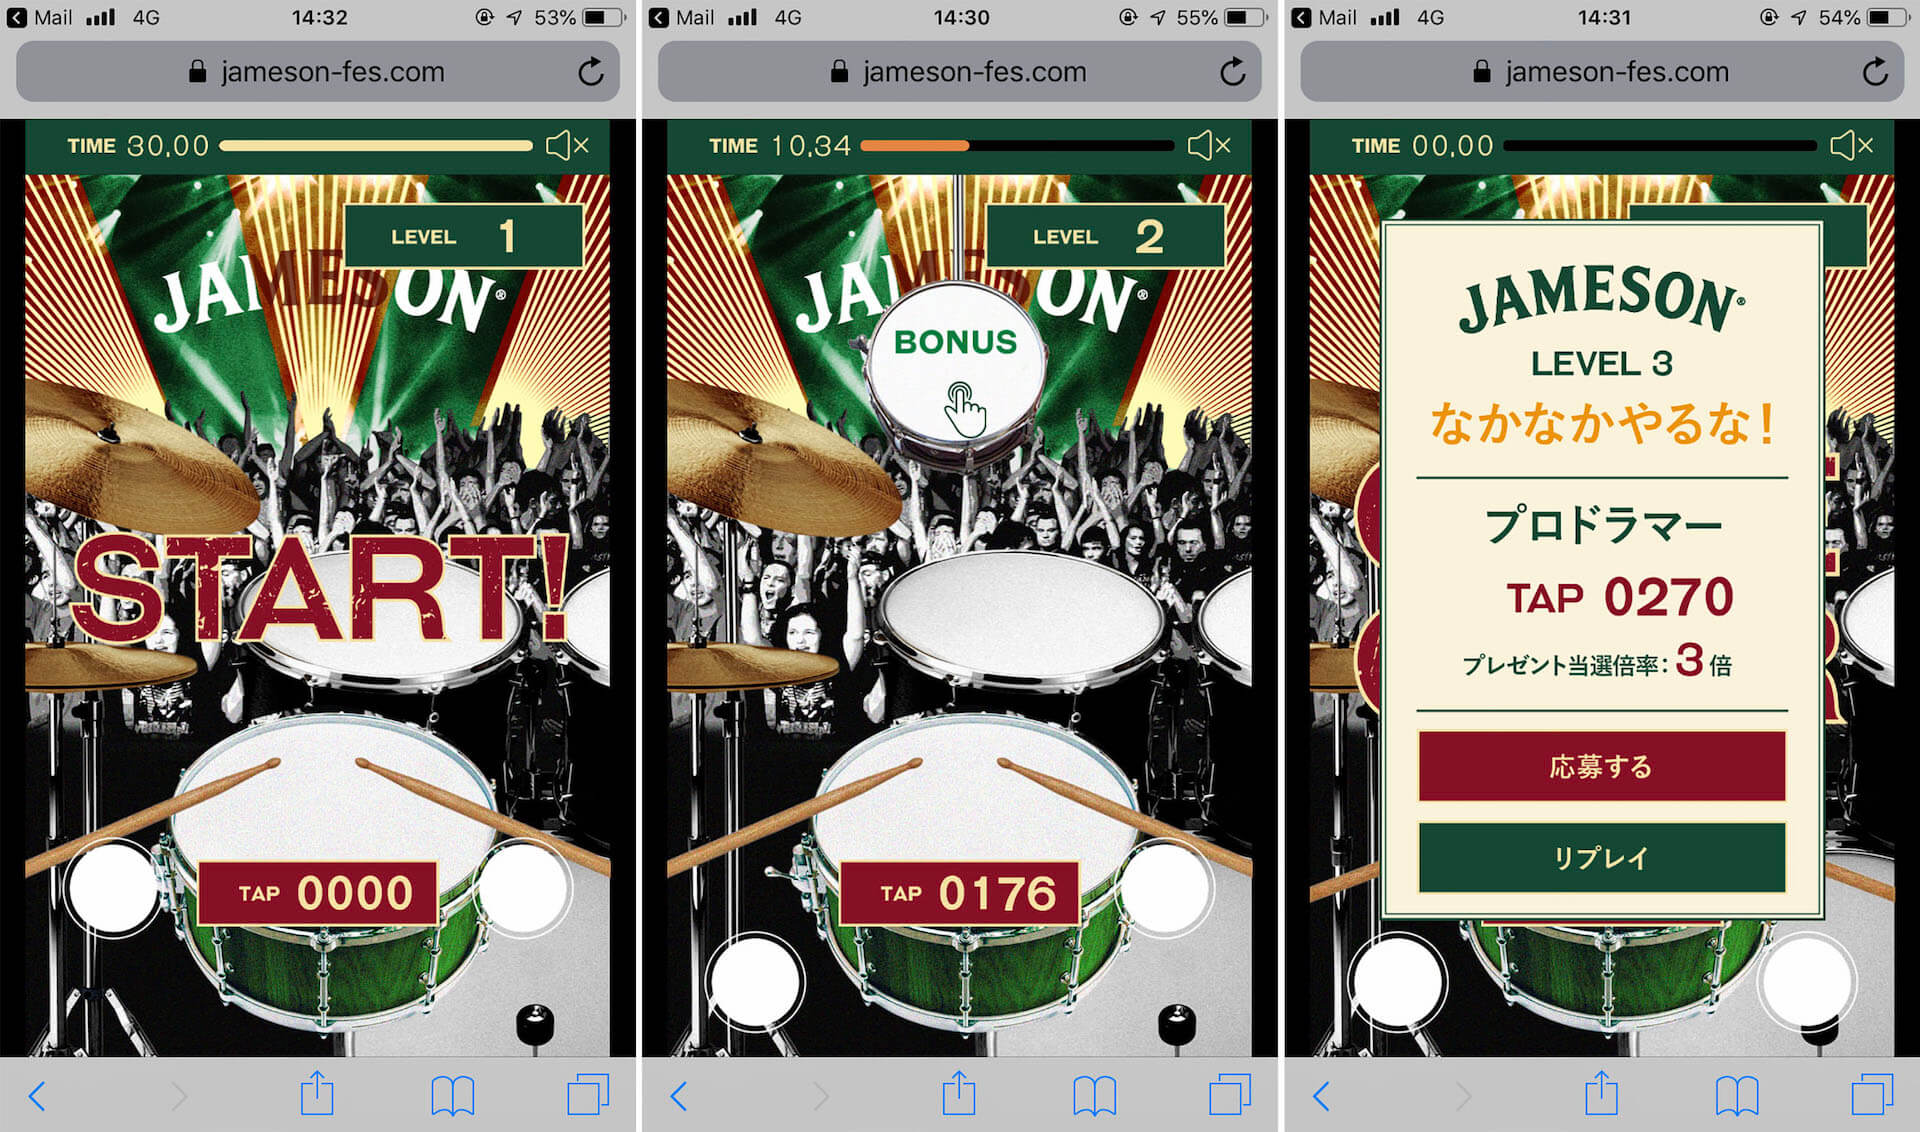 <Jameson Halloween Fes 2>本日開催!ジェムソンがコラボする3バンド、DATS、グッドモーニングアメリカらに注目 music190917_jameson_halloween_6